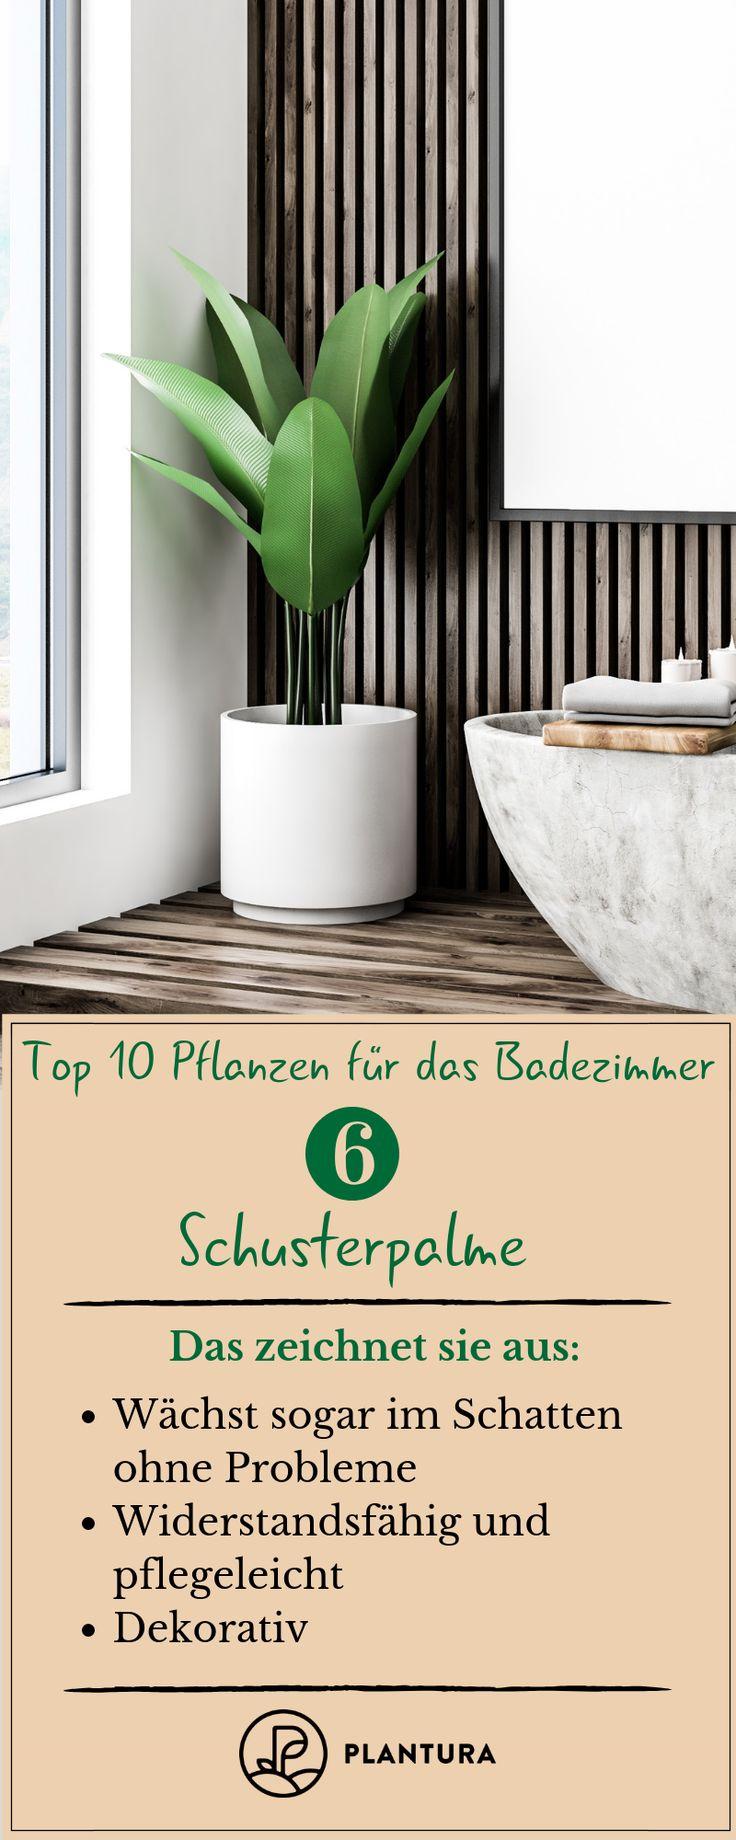 Pflanzen fürs Badezimmer: Unsere Top 10 – Plantura   Garten Ideen & Tipps   Gemüse, Obst, Kräuter